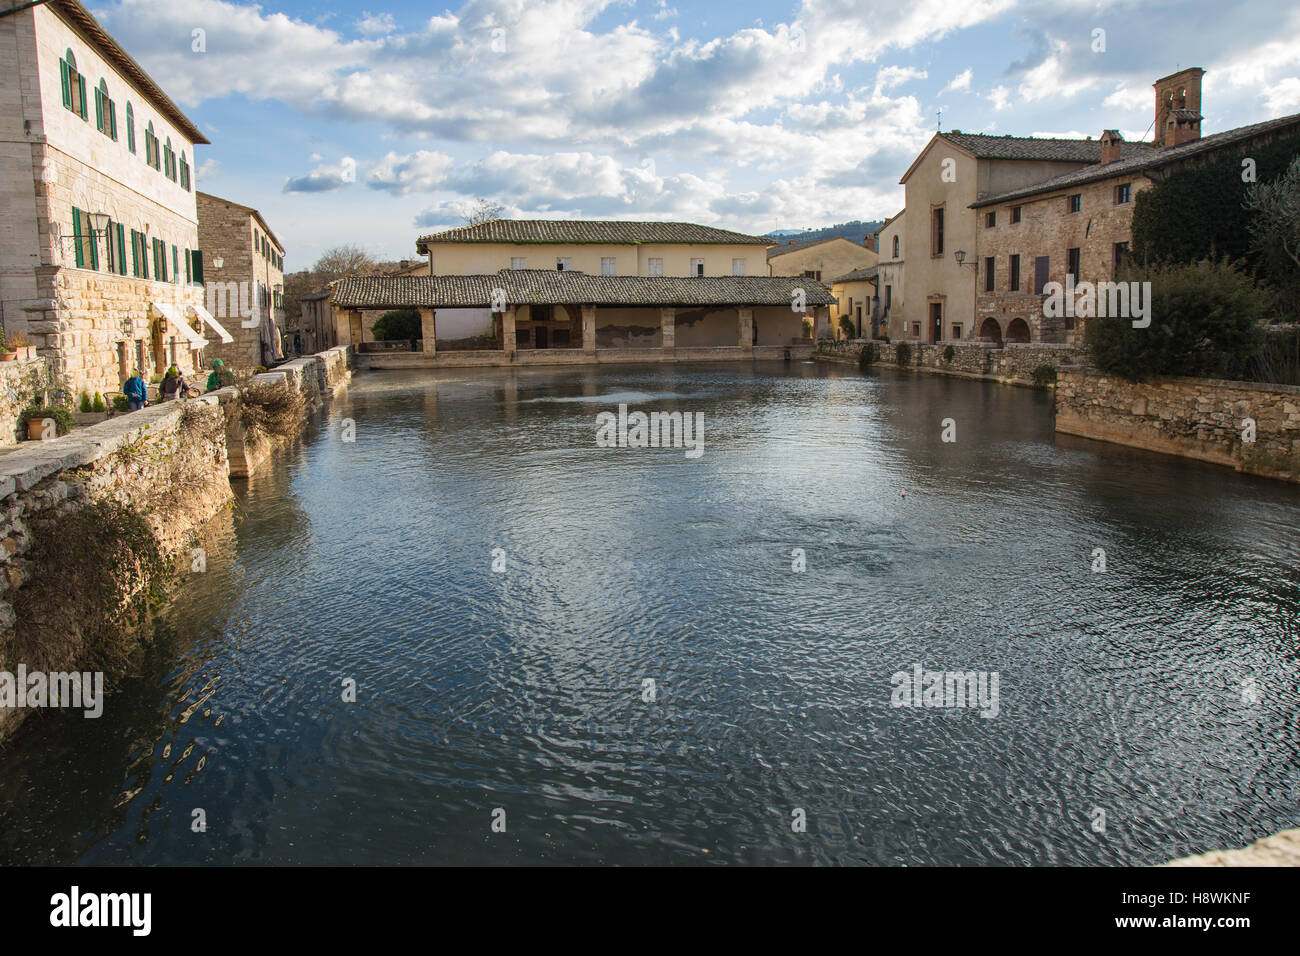 The ancient baths of Bagno Vignoni Tuscany Stock Photo